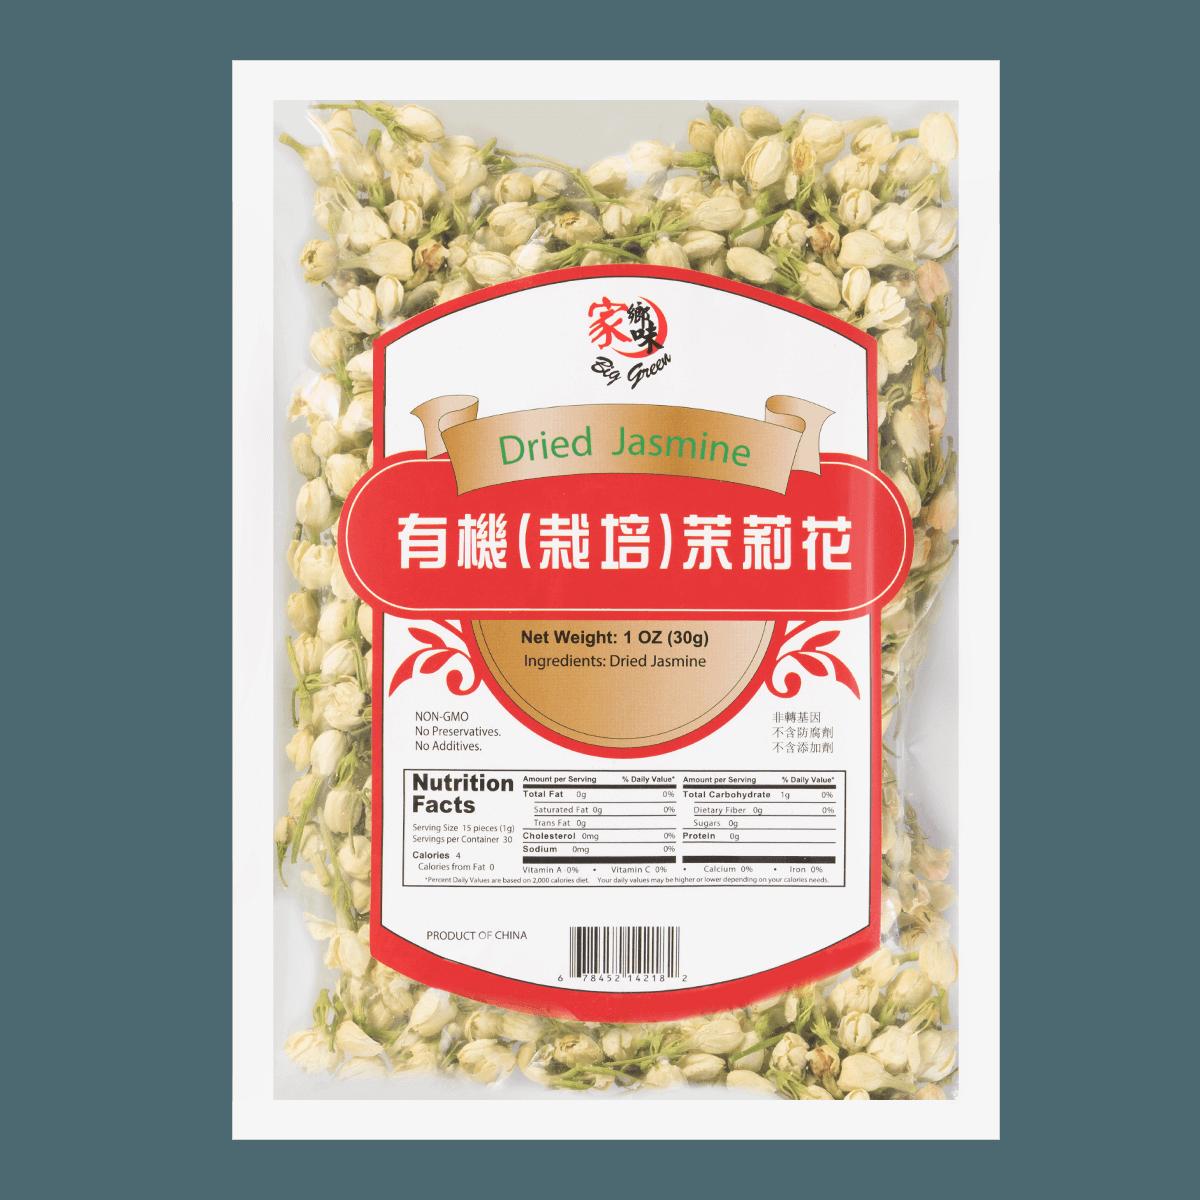 BIG GREEN Organic Dried Jasmine 30g